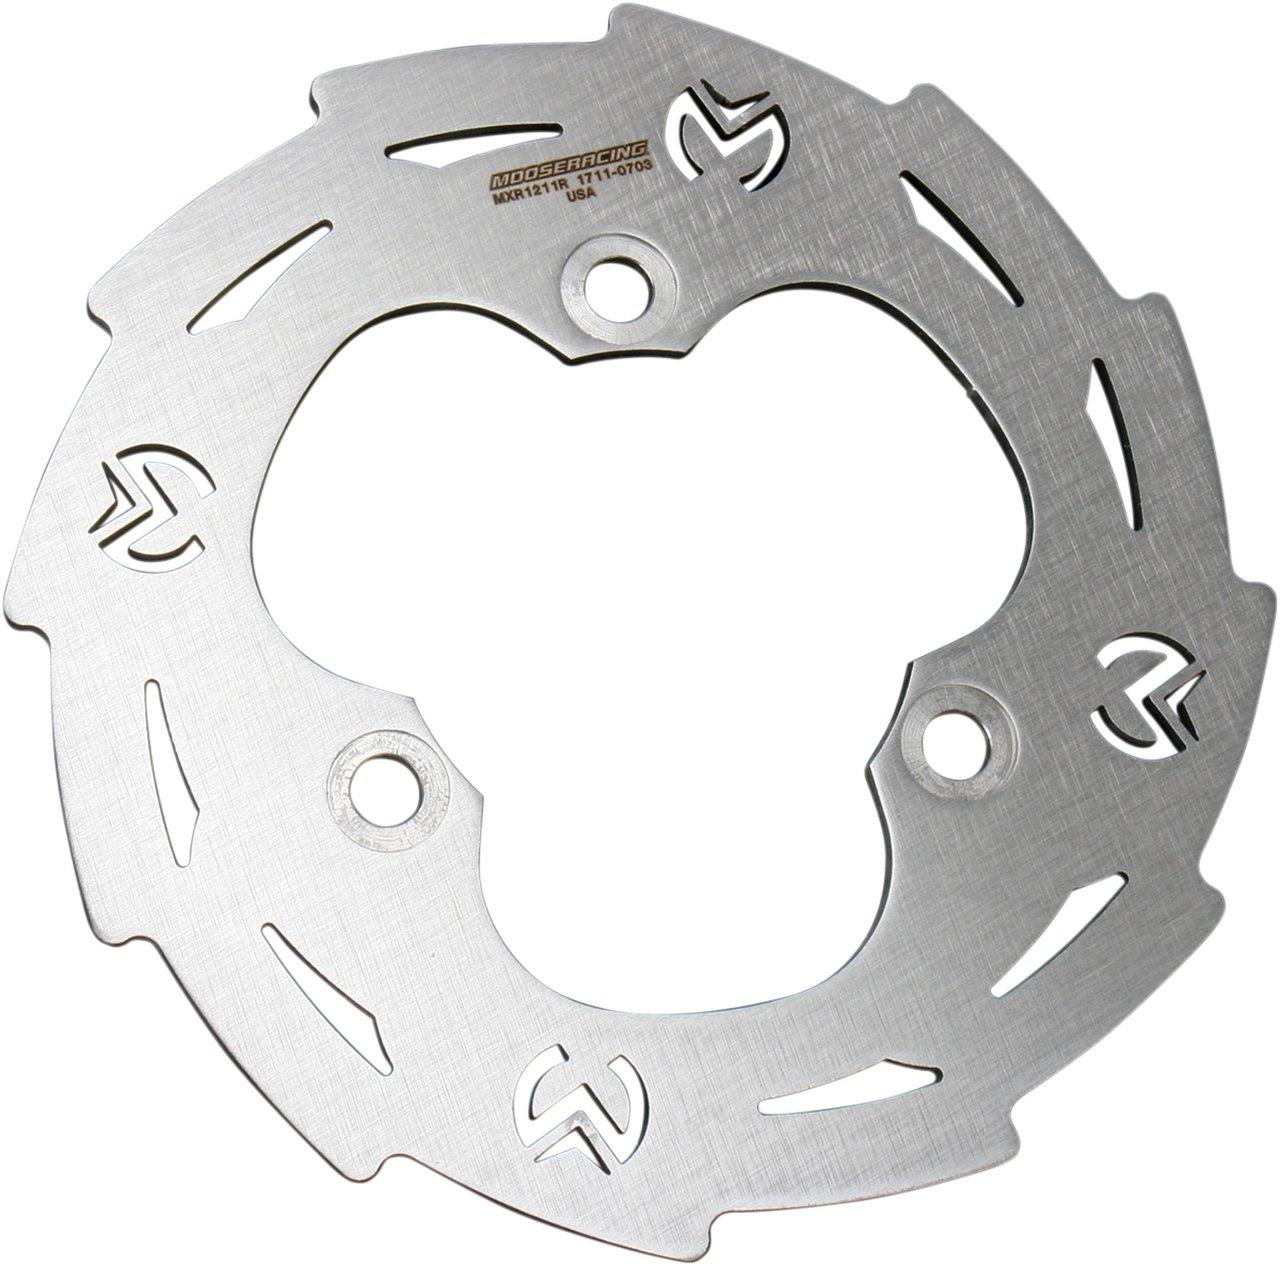 【MOOSE RACING】MXR BLADE 後煞車碟盤 [1711-0703] - 「Webike-摩托百貨」